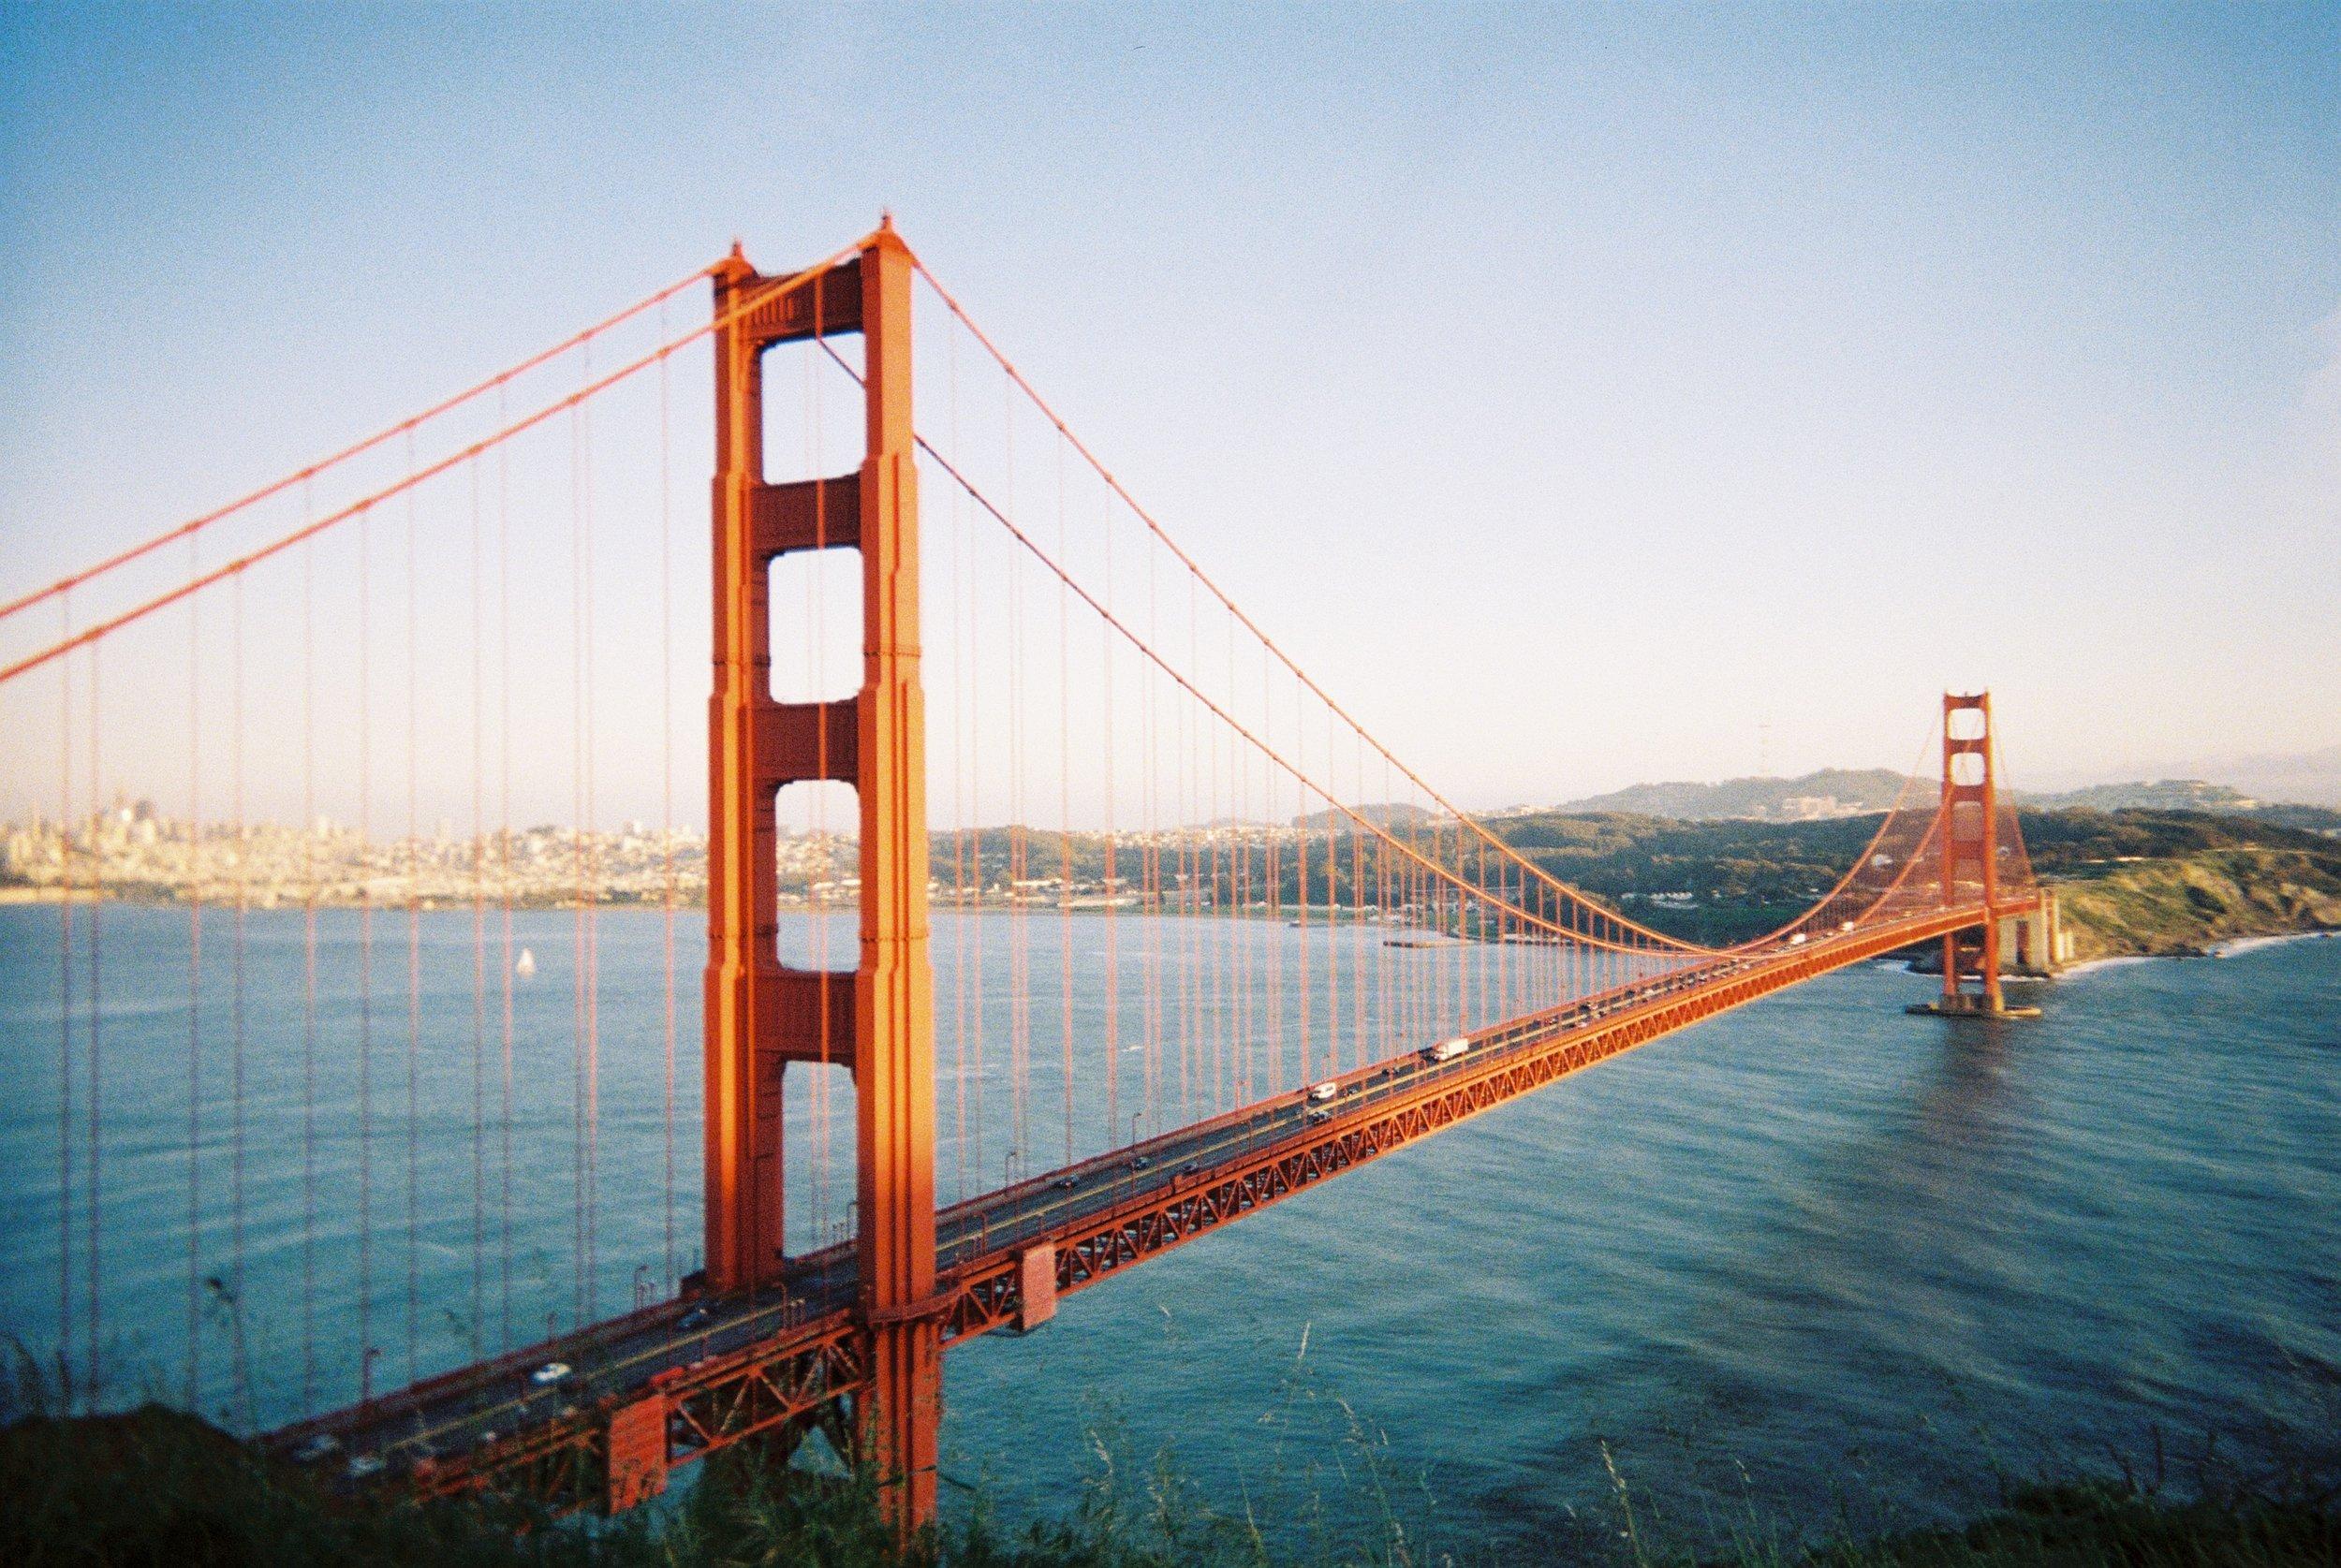 The Golden Gate Bridge I San Francisco, California